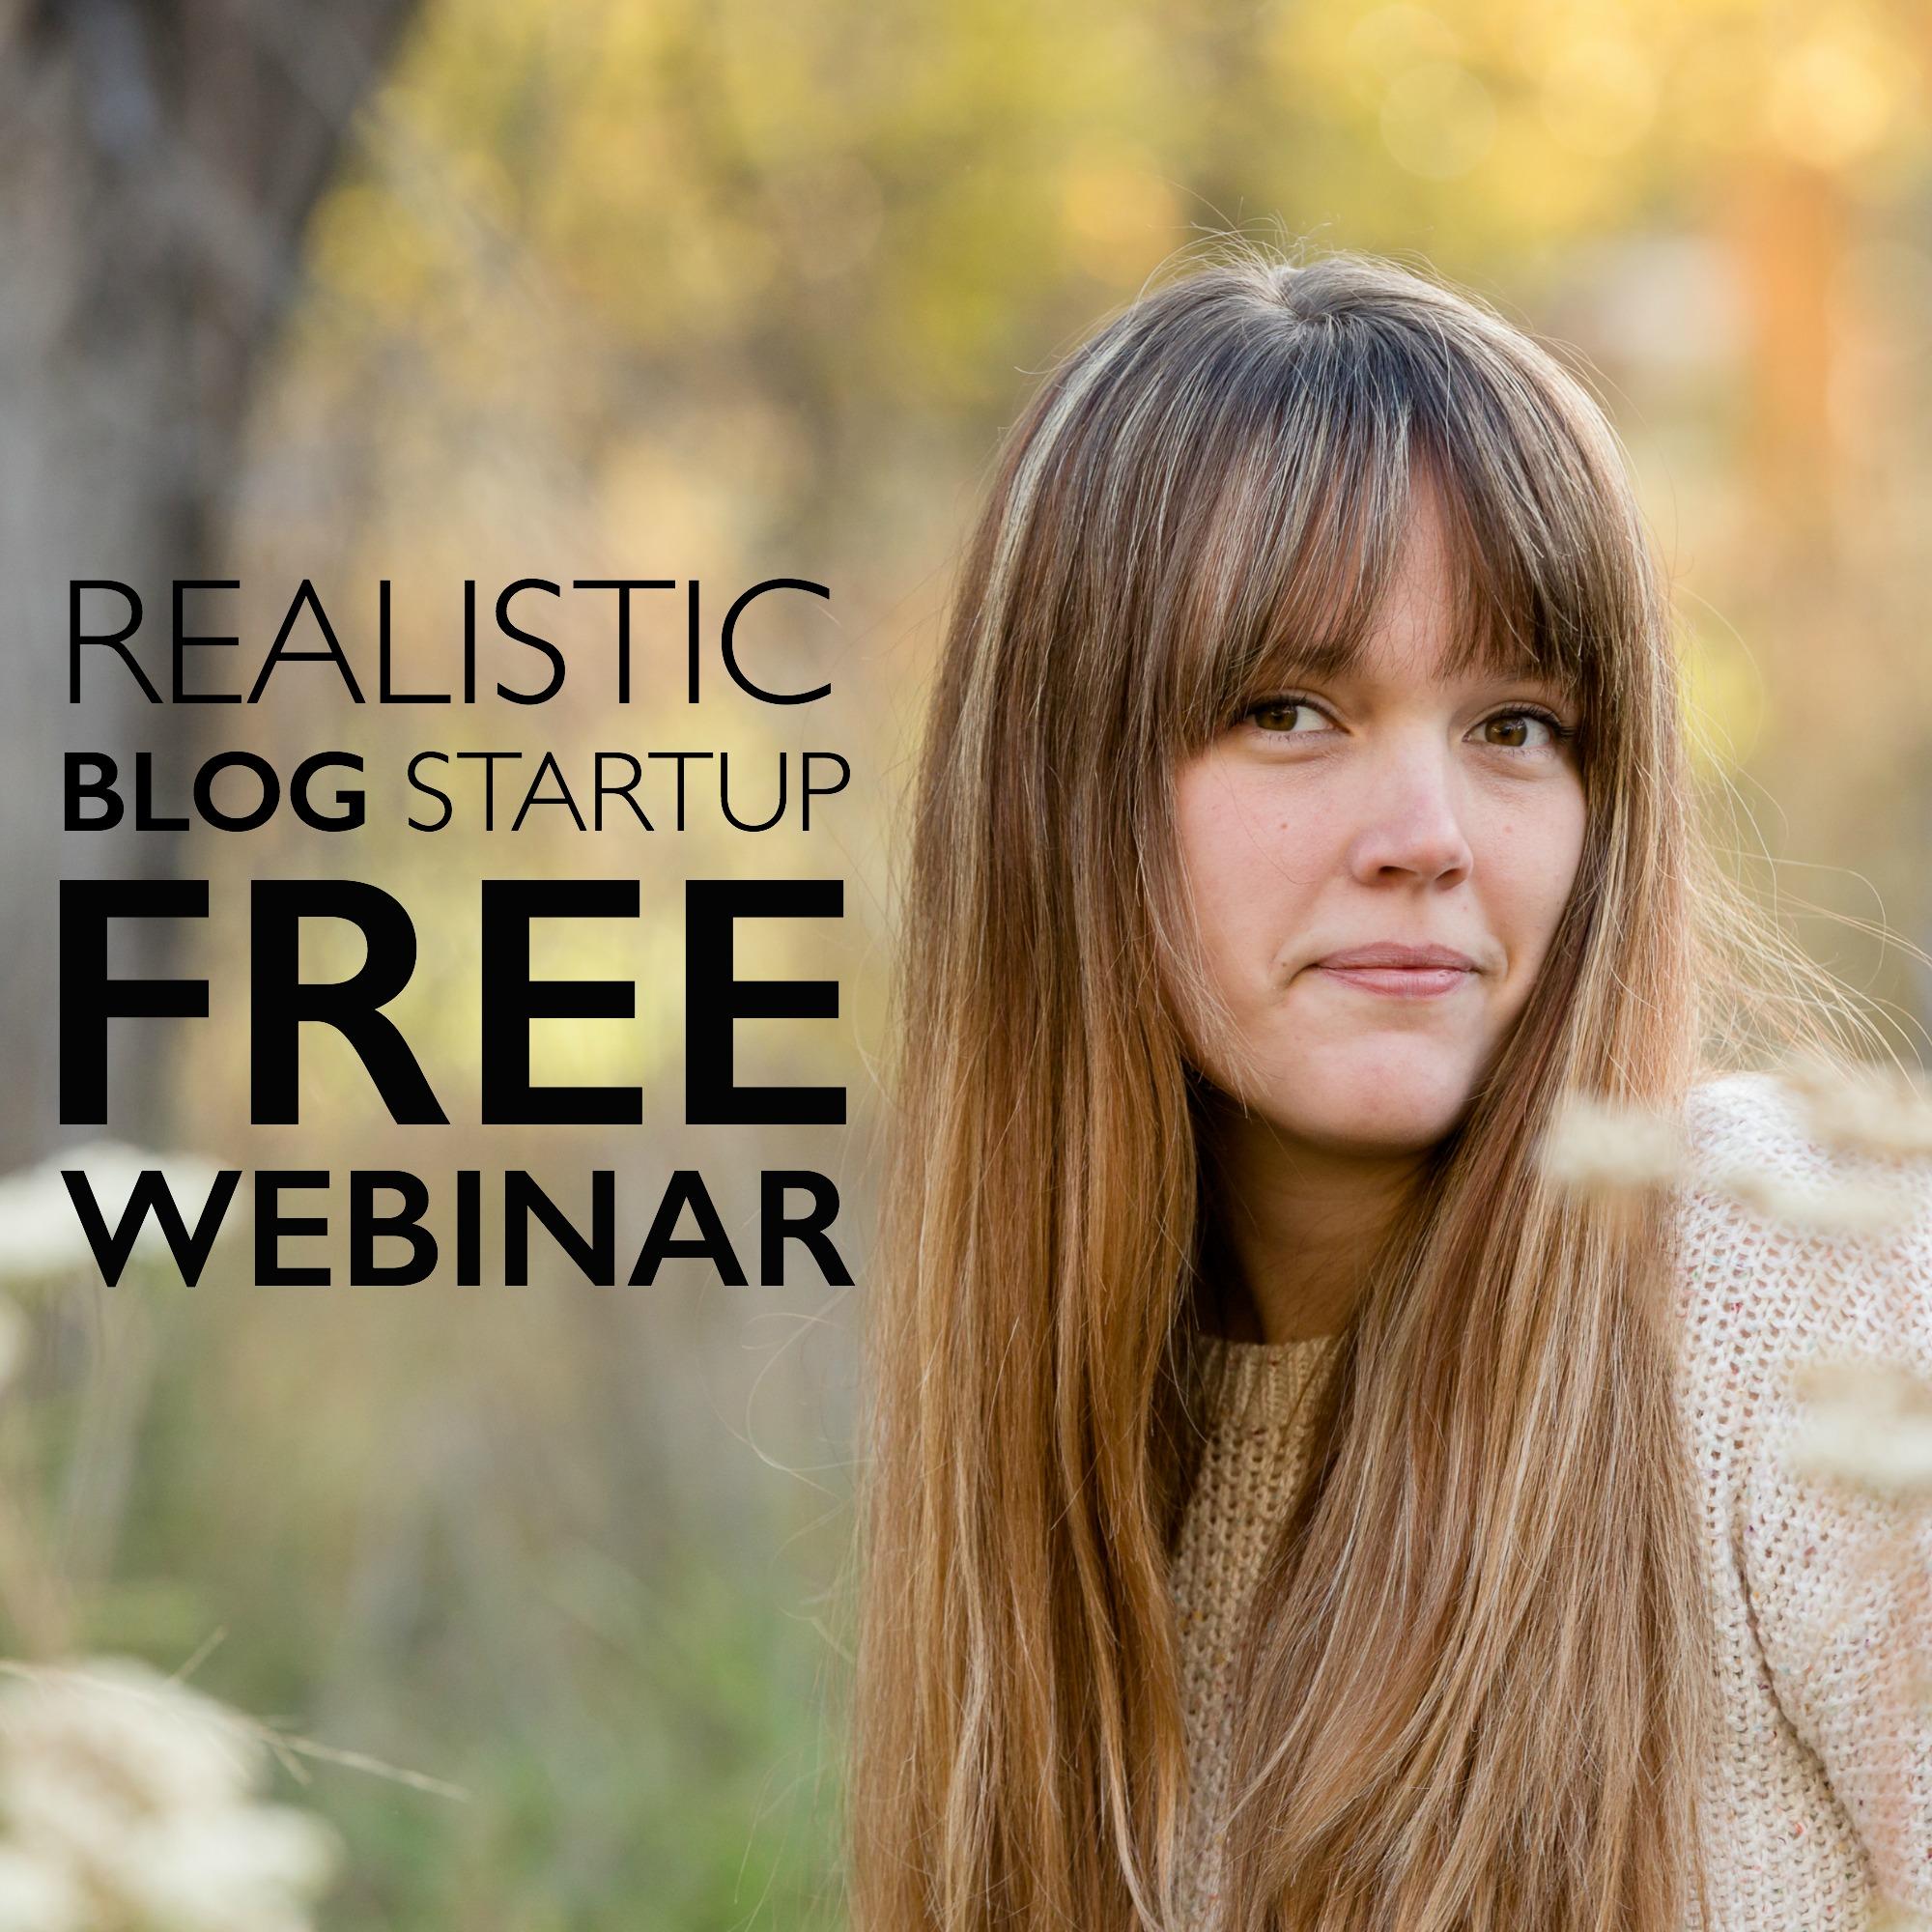 Realistic Blog Startup Free Webinar